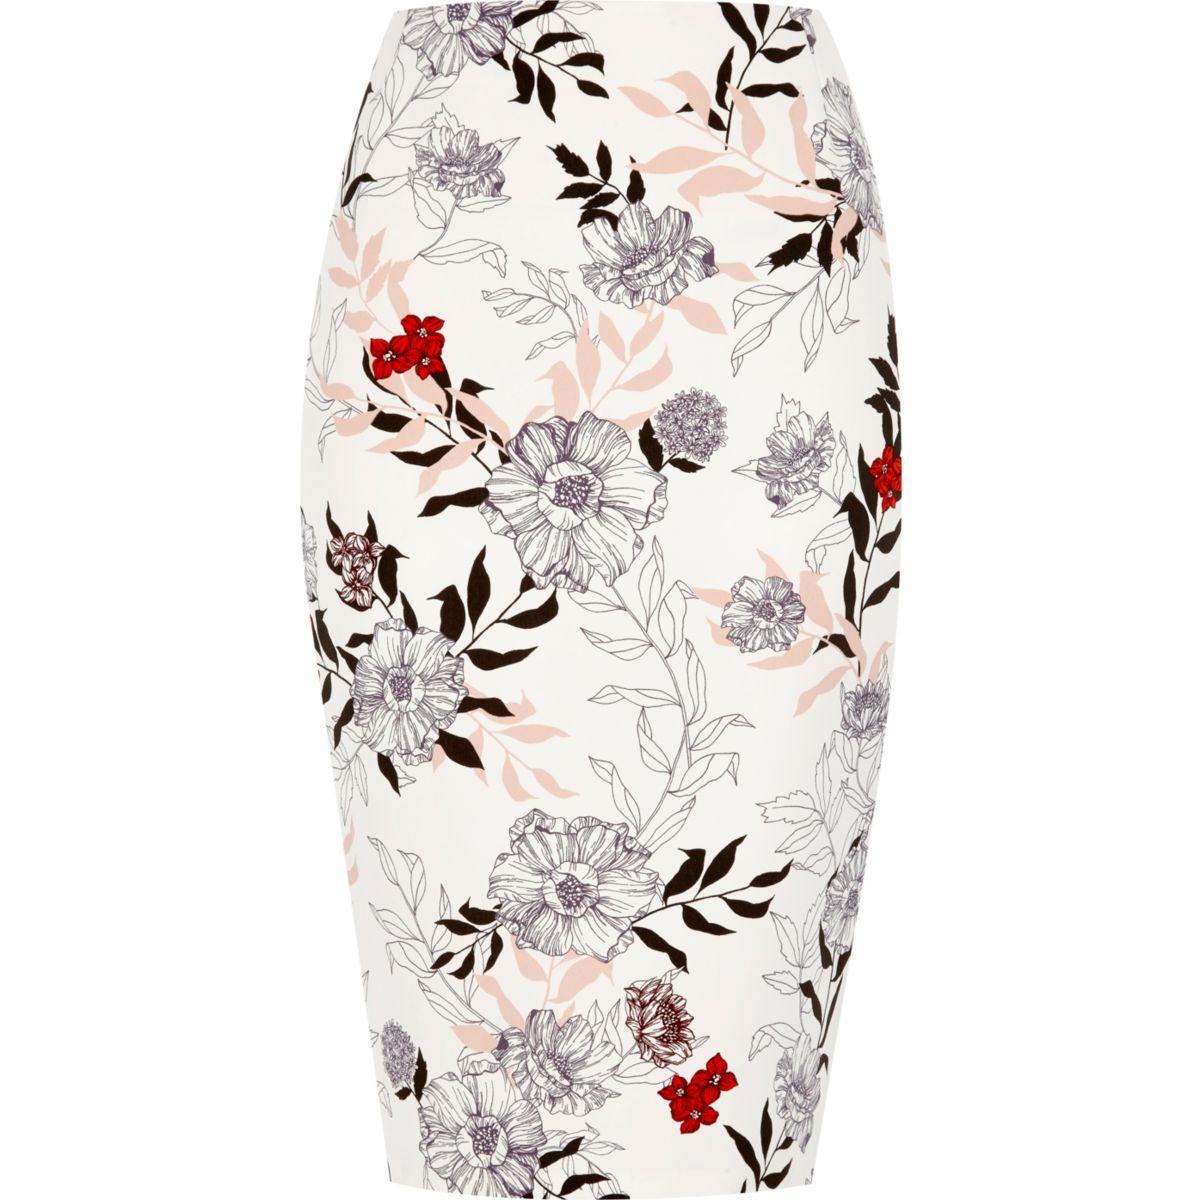 Cream floral print pencil skirt